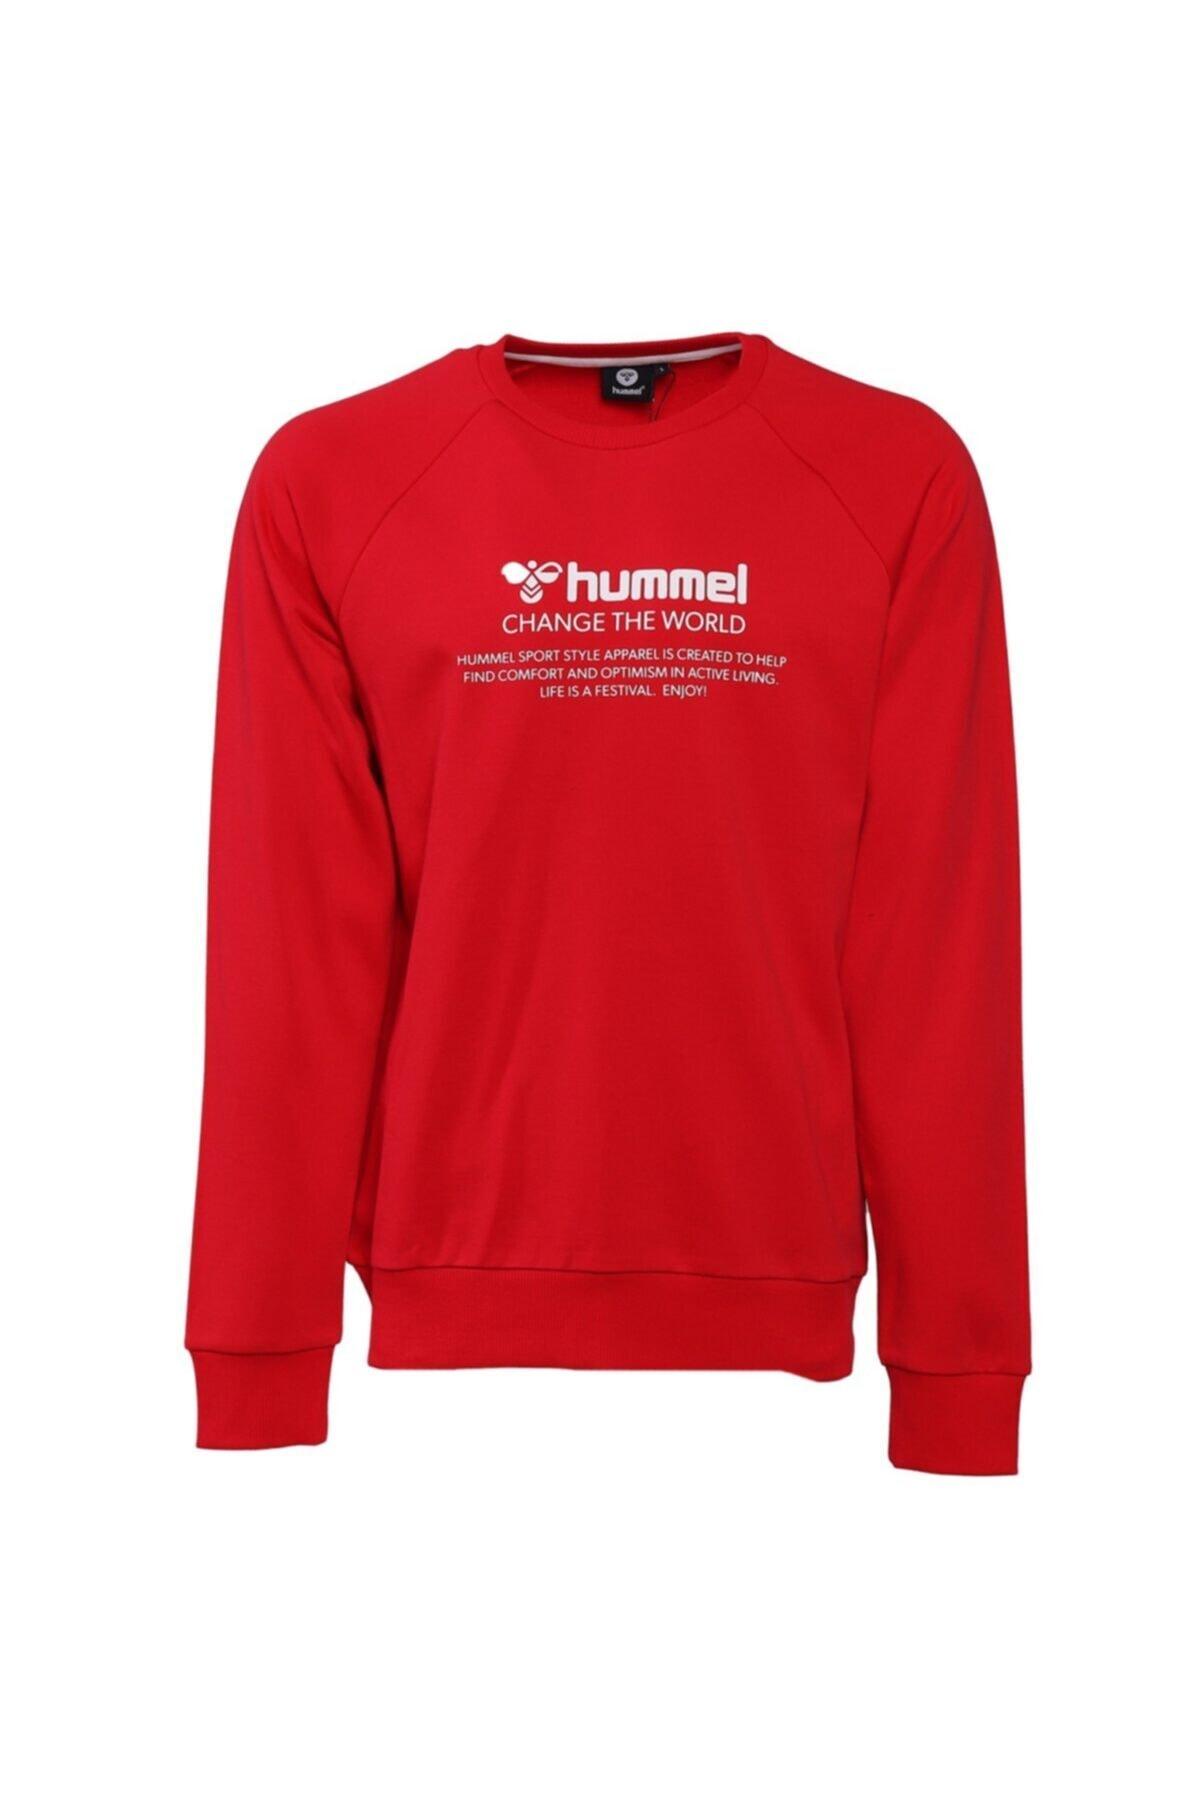 HUMMEL Erkek Kırmızı Sweatshirt 1